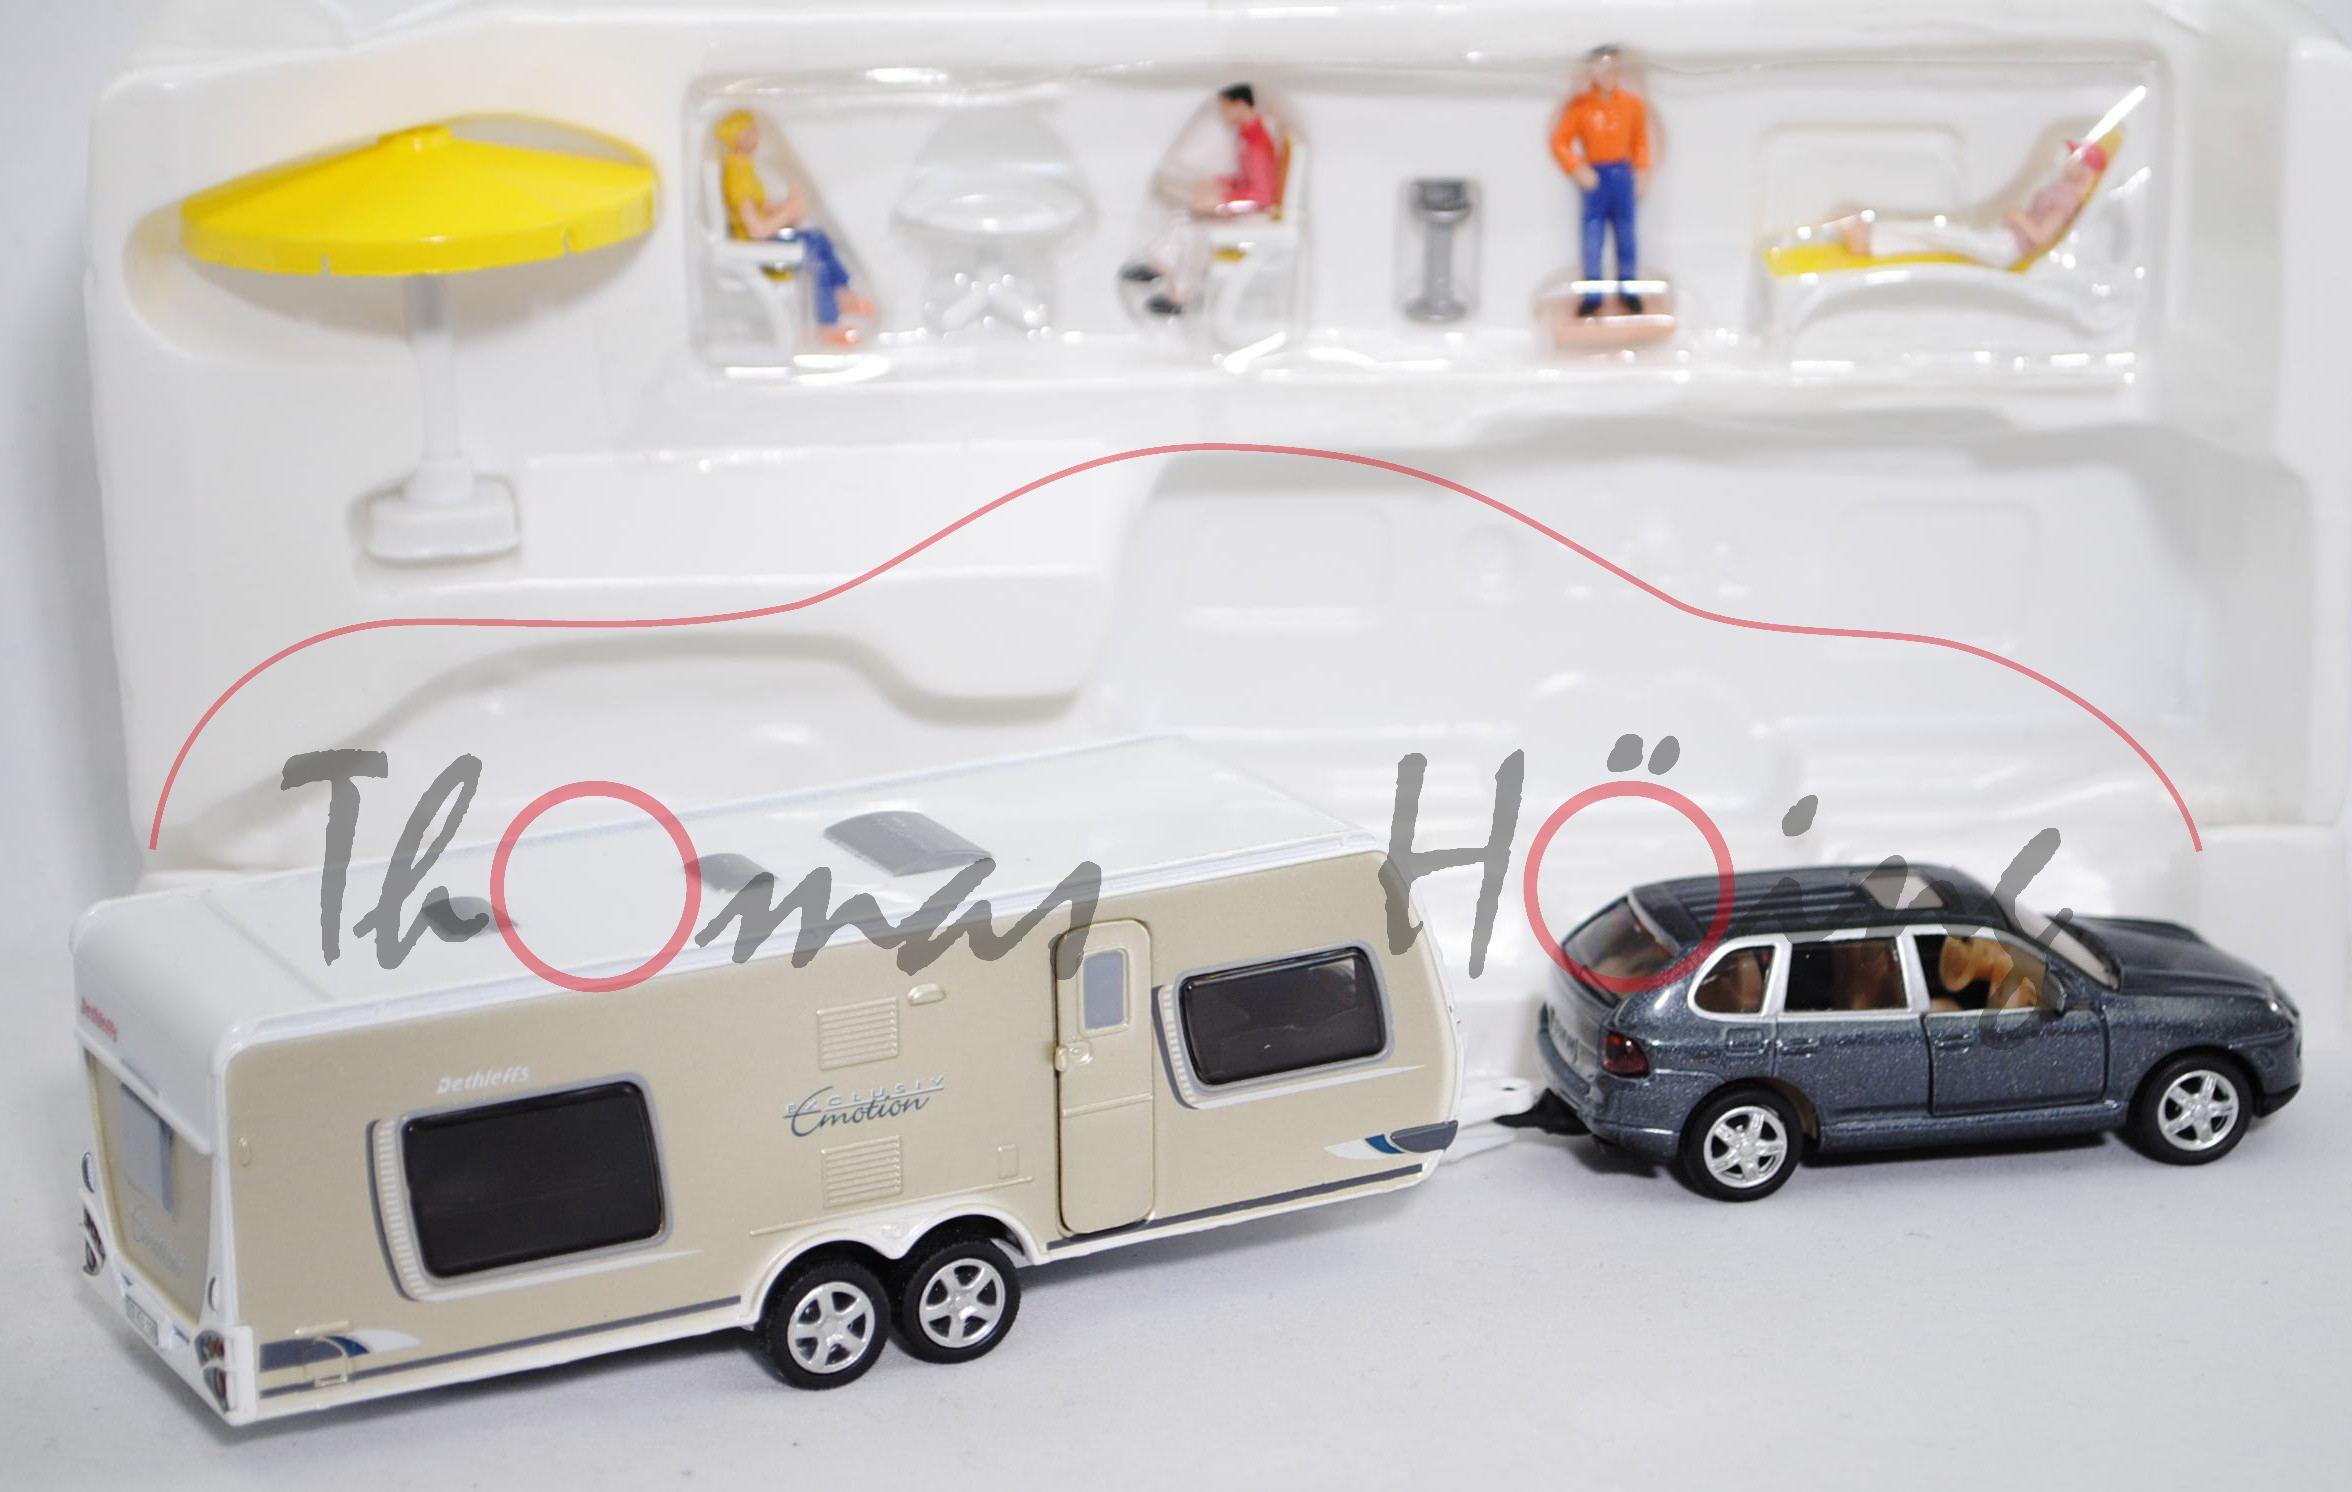 00001 porsche cayenne turbo mit dethleffs exclusive. Black Bedroom Furniture Sets. Home Design Ideas